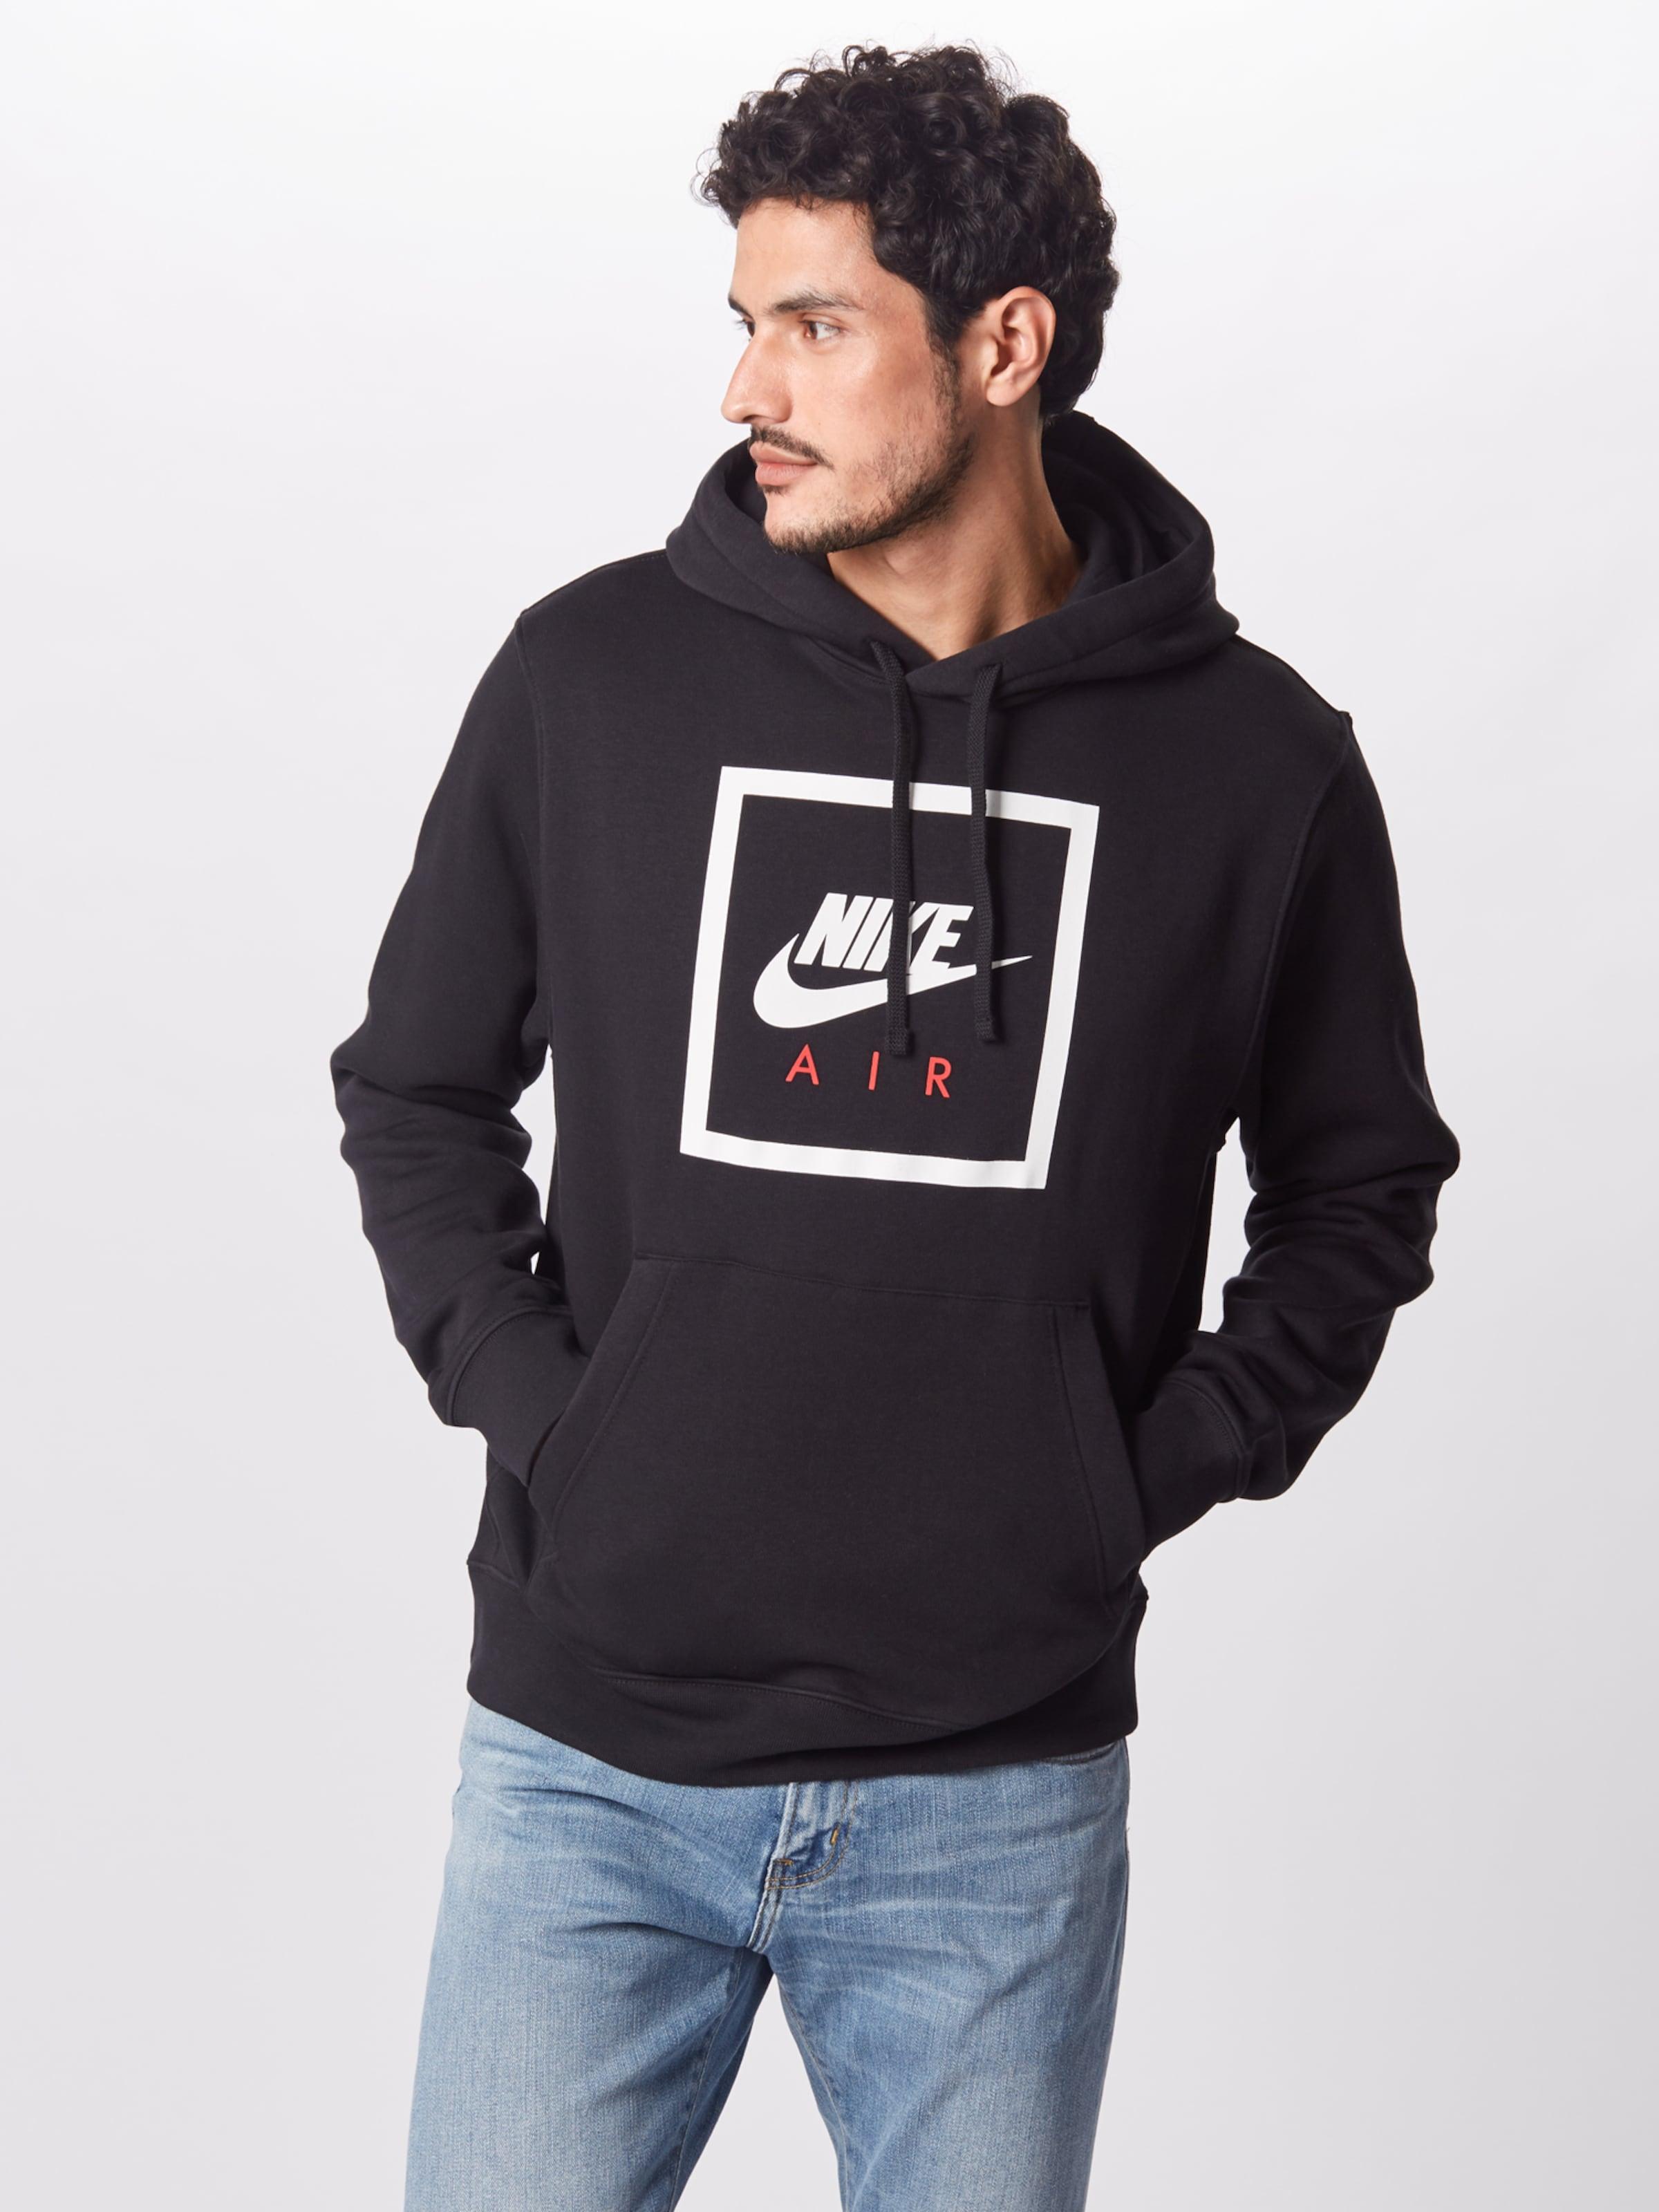 Sweat shirt En Sportswear Nike 'air Schwarz 5' vNnwOm0y8